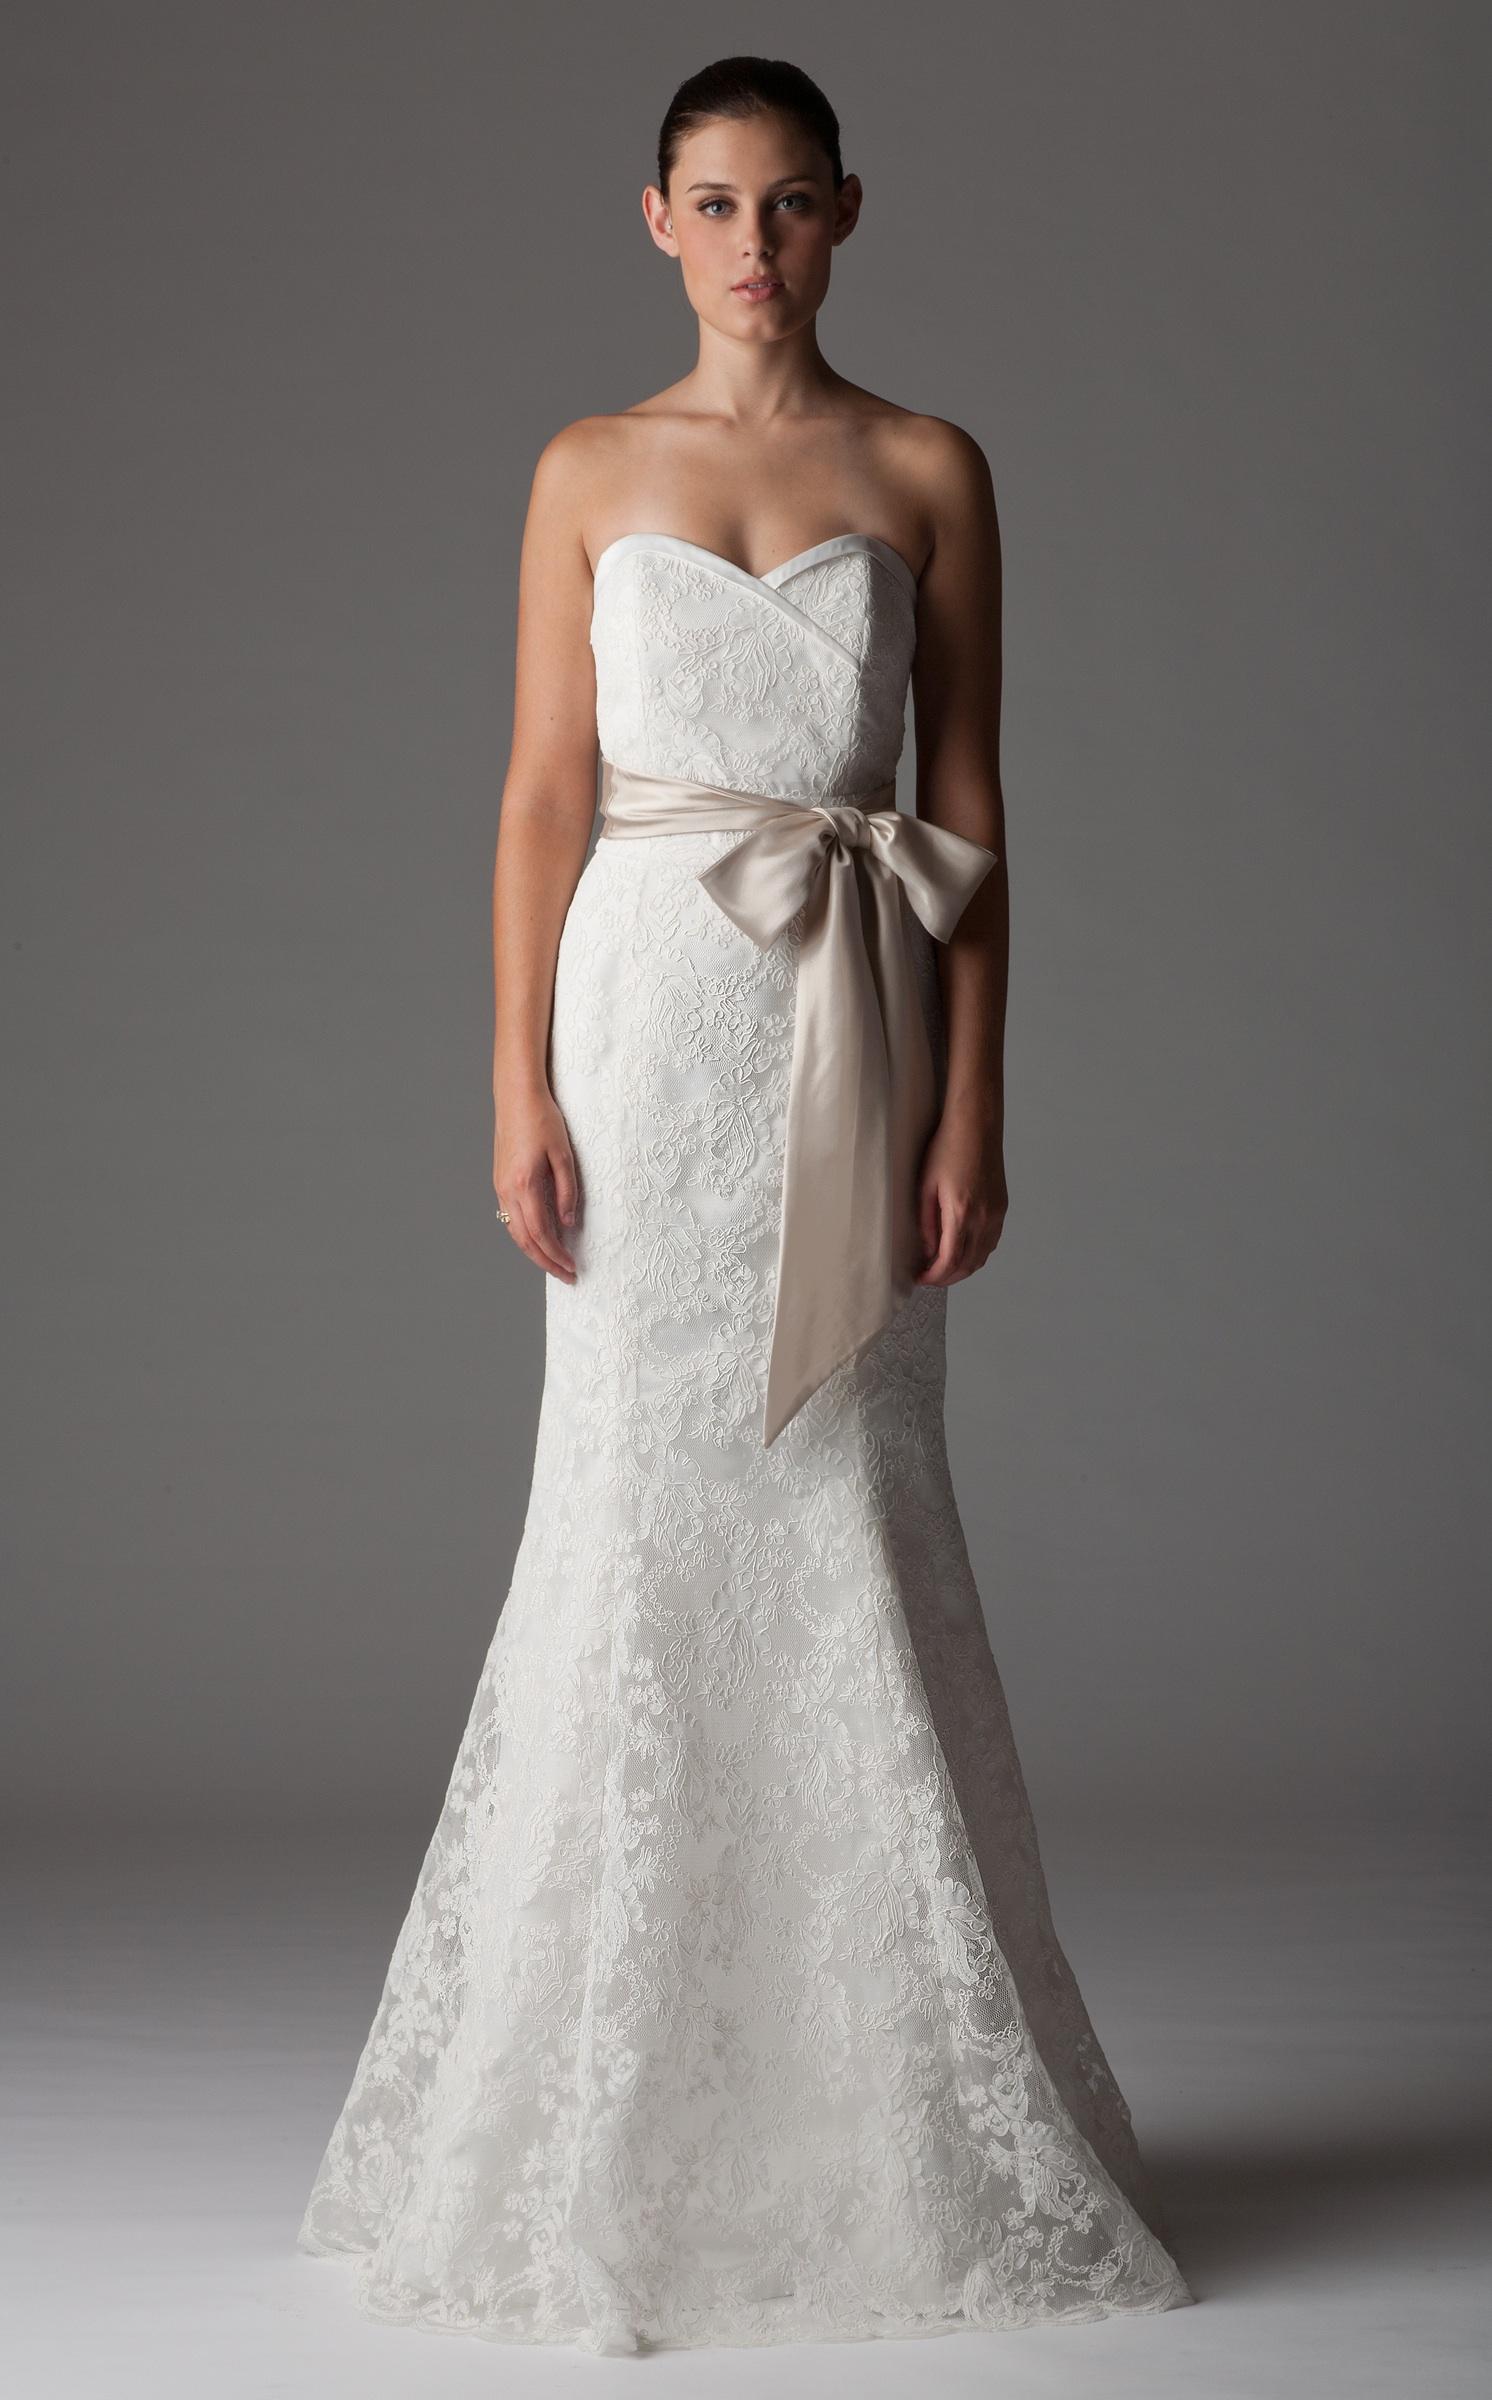 Lace Wedding Dress Sash